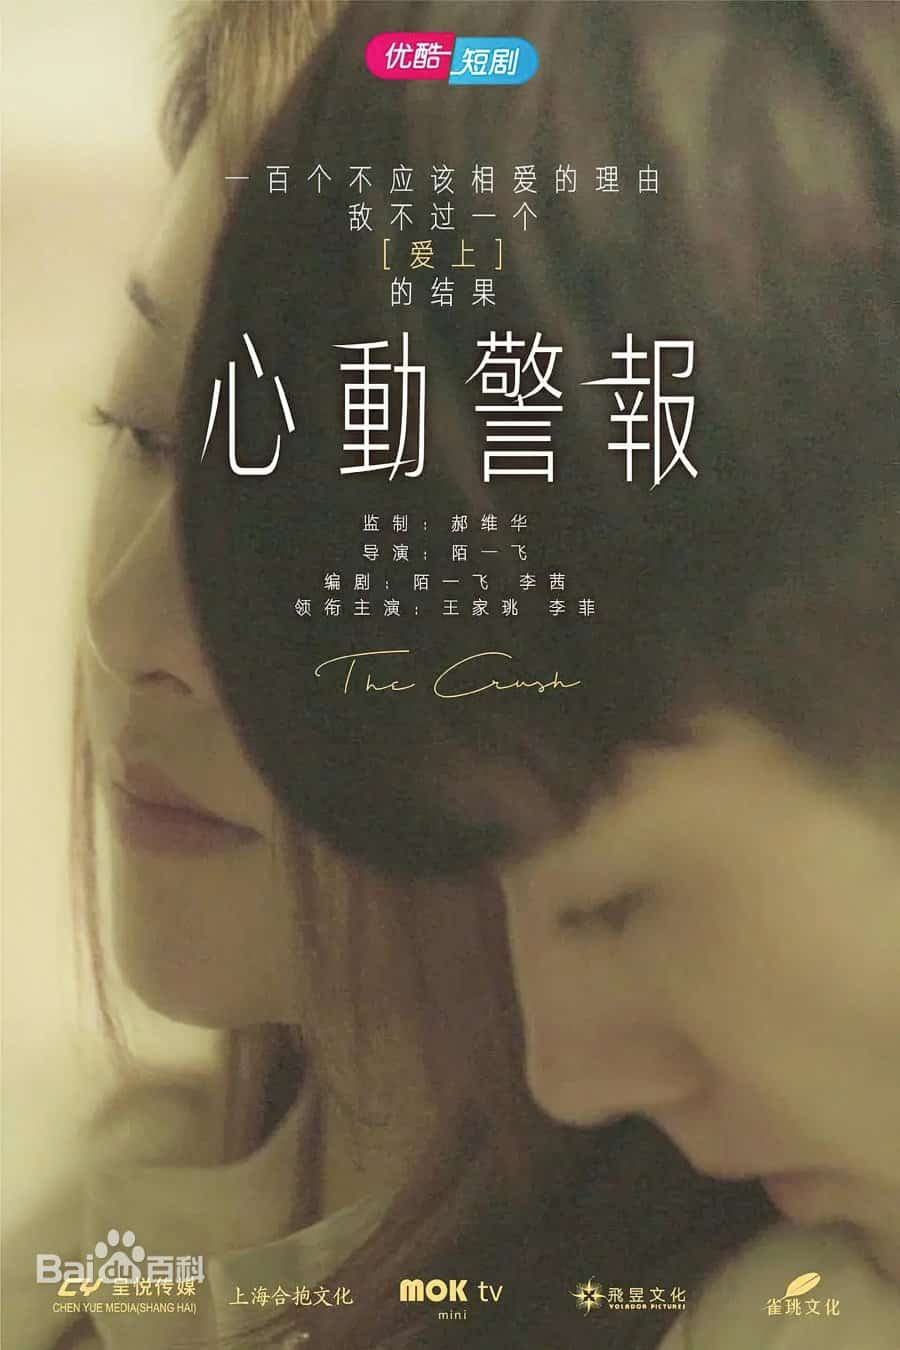 The Crush Season 1 (2020) สัญญาณหัวใจบอกรัก ซับไทย EP1-EP30 [จบ]